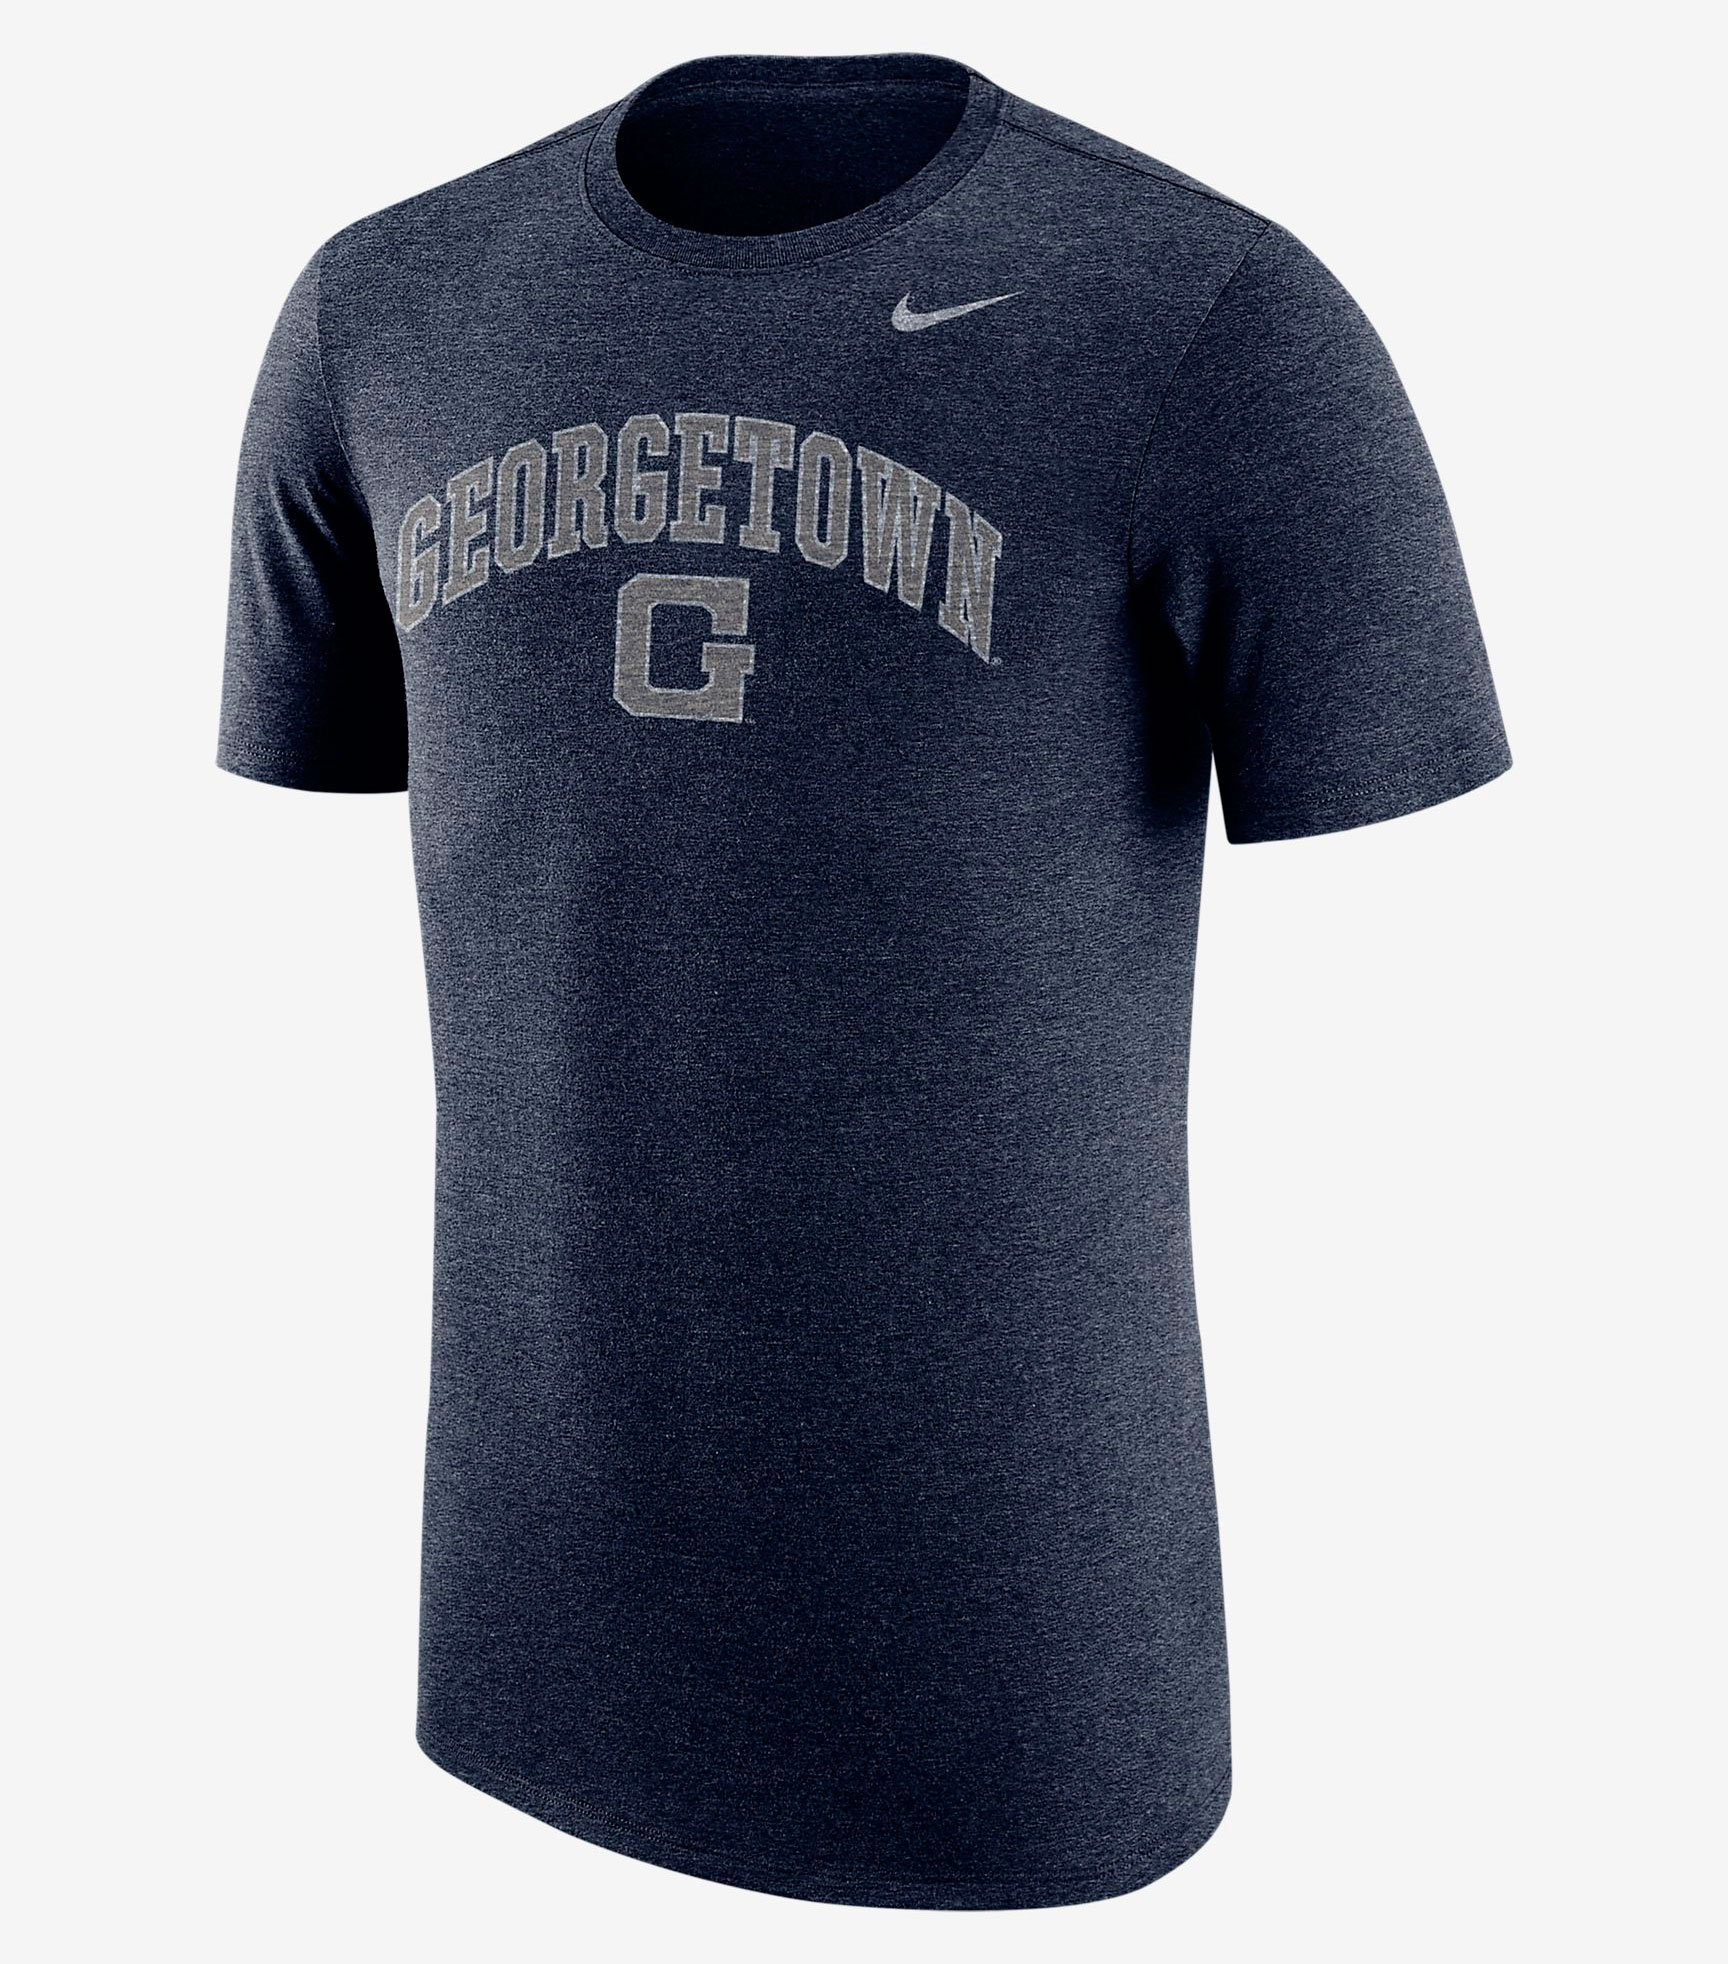 georgetown-jordan-3-nike-shirt